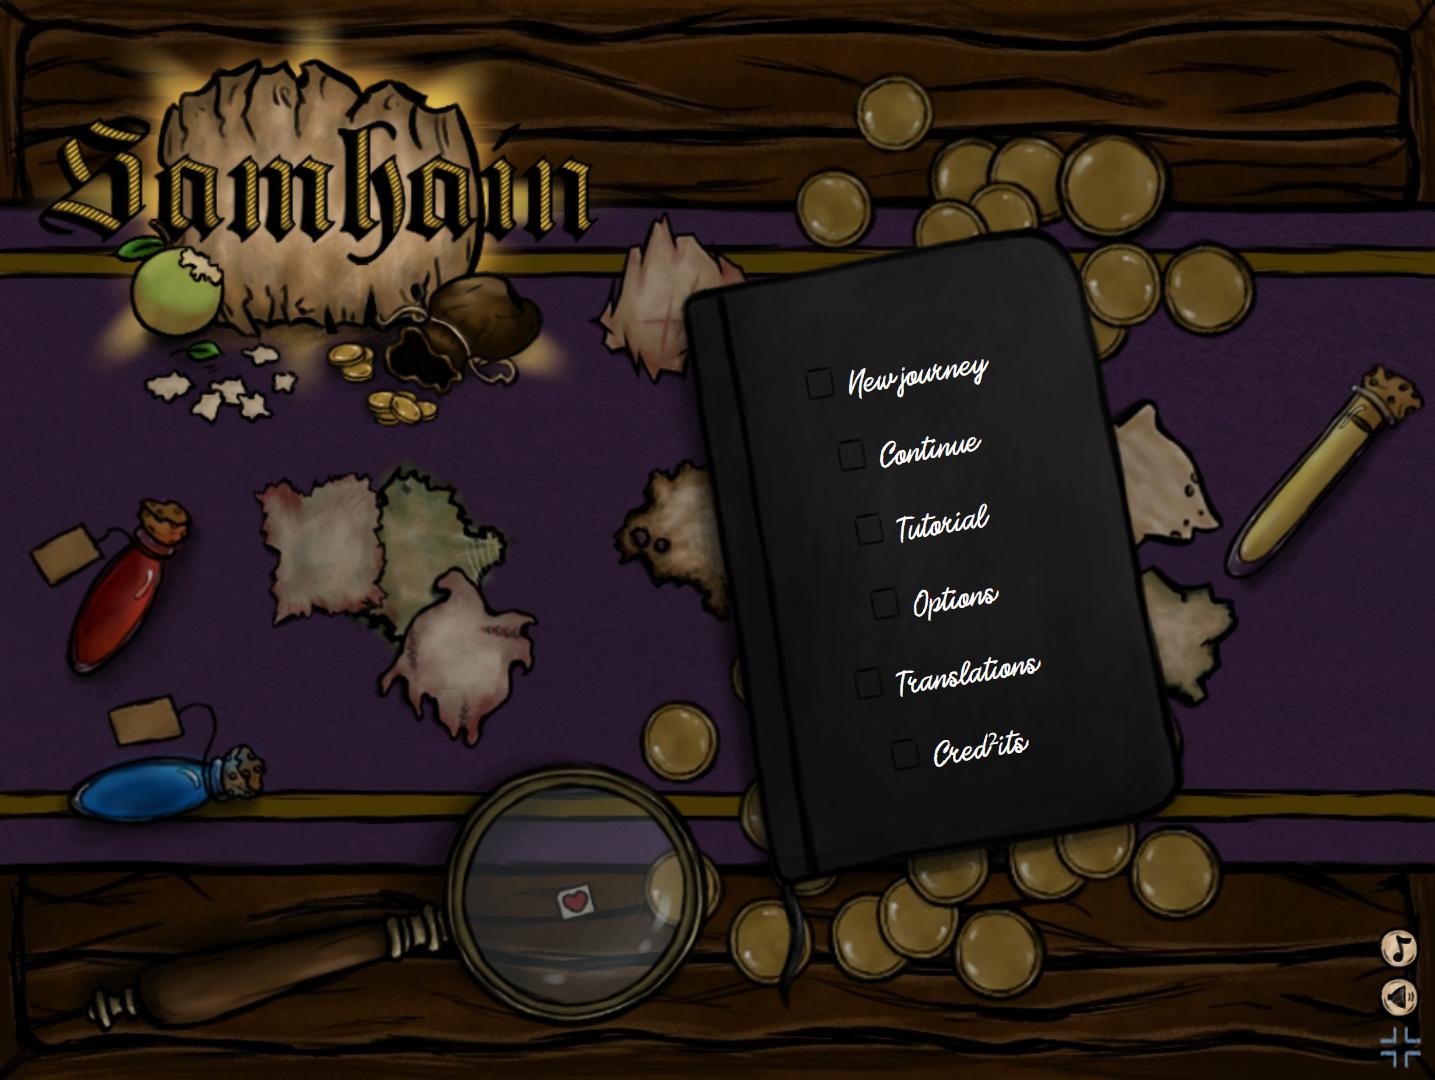 Samhain - Game menu